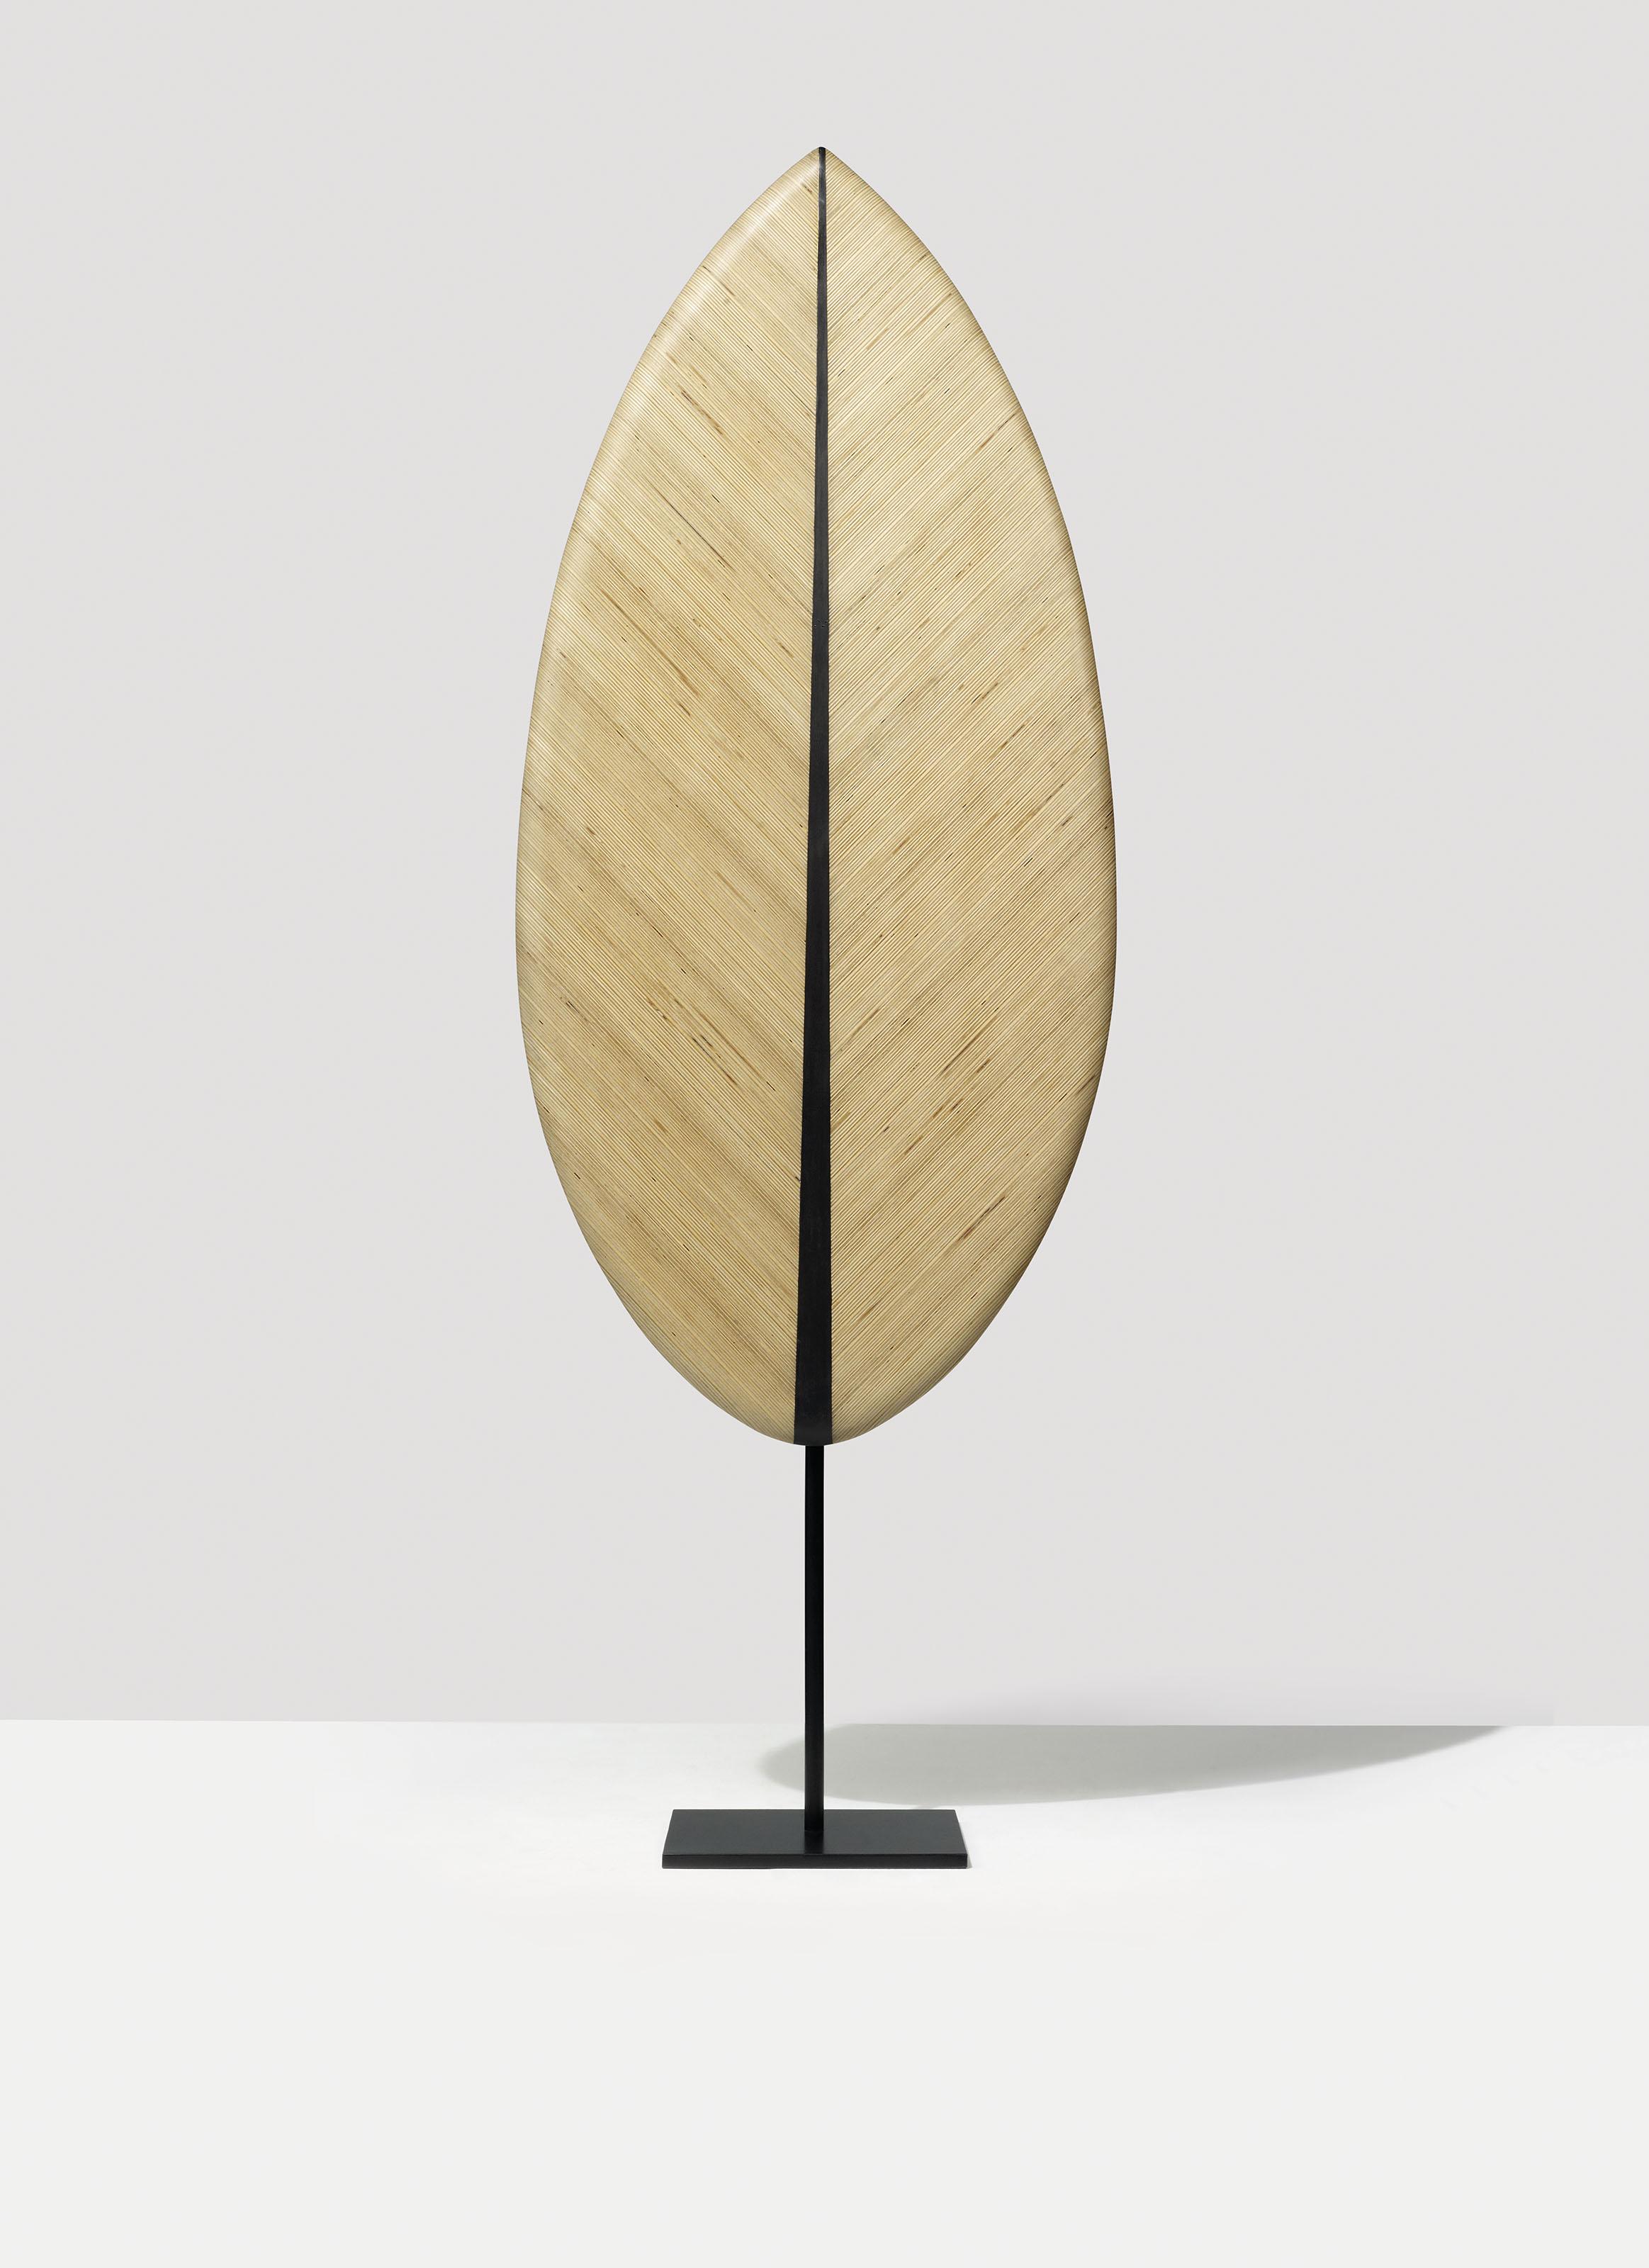 A Monumental Prototype 'Leaf'